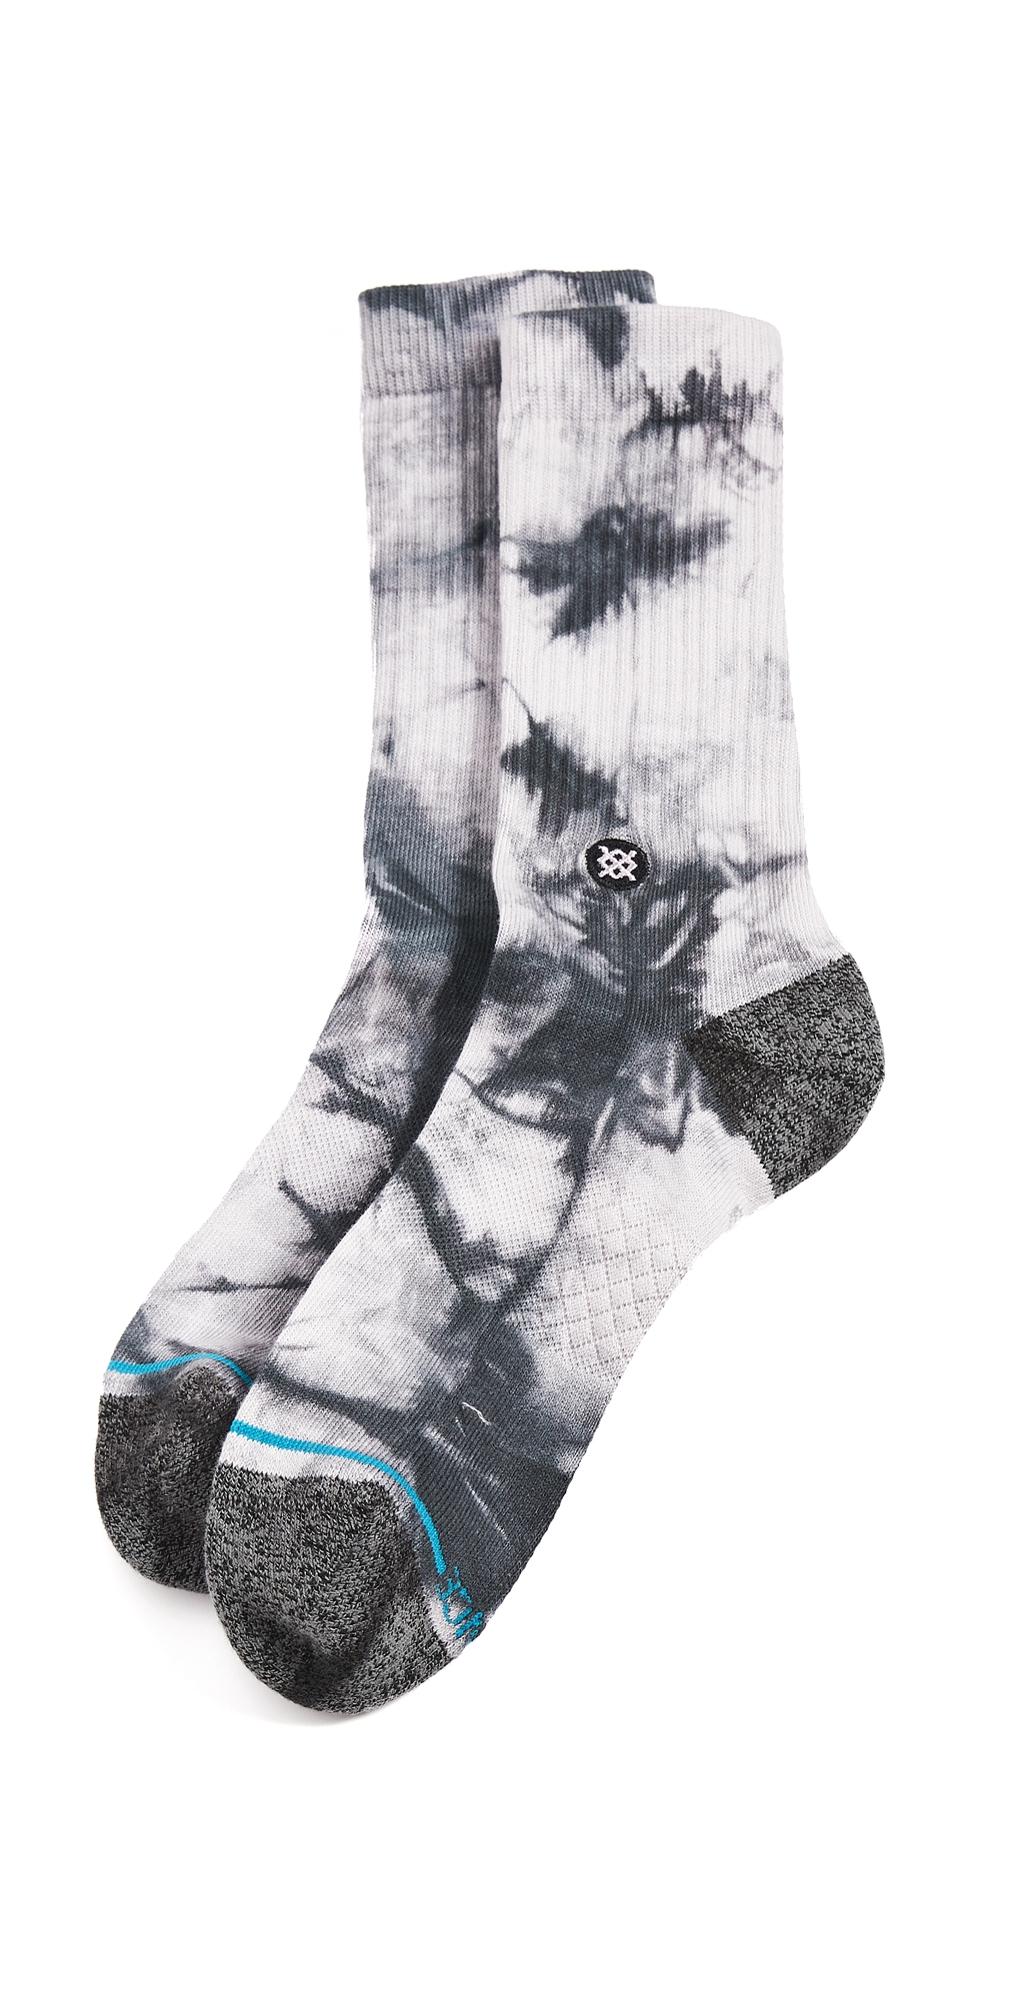 STANCE Burnout 2 Crew Socks